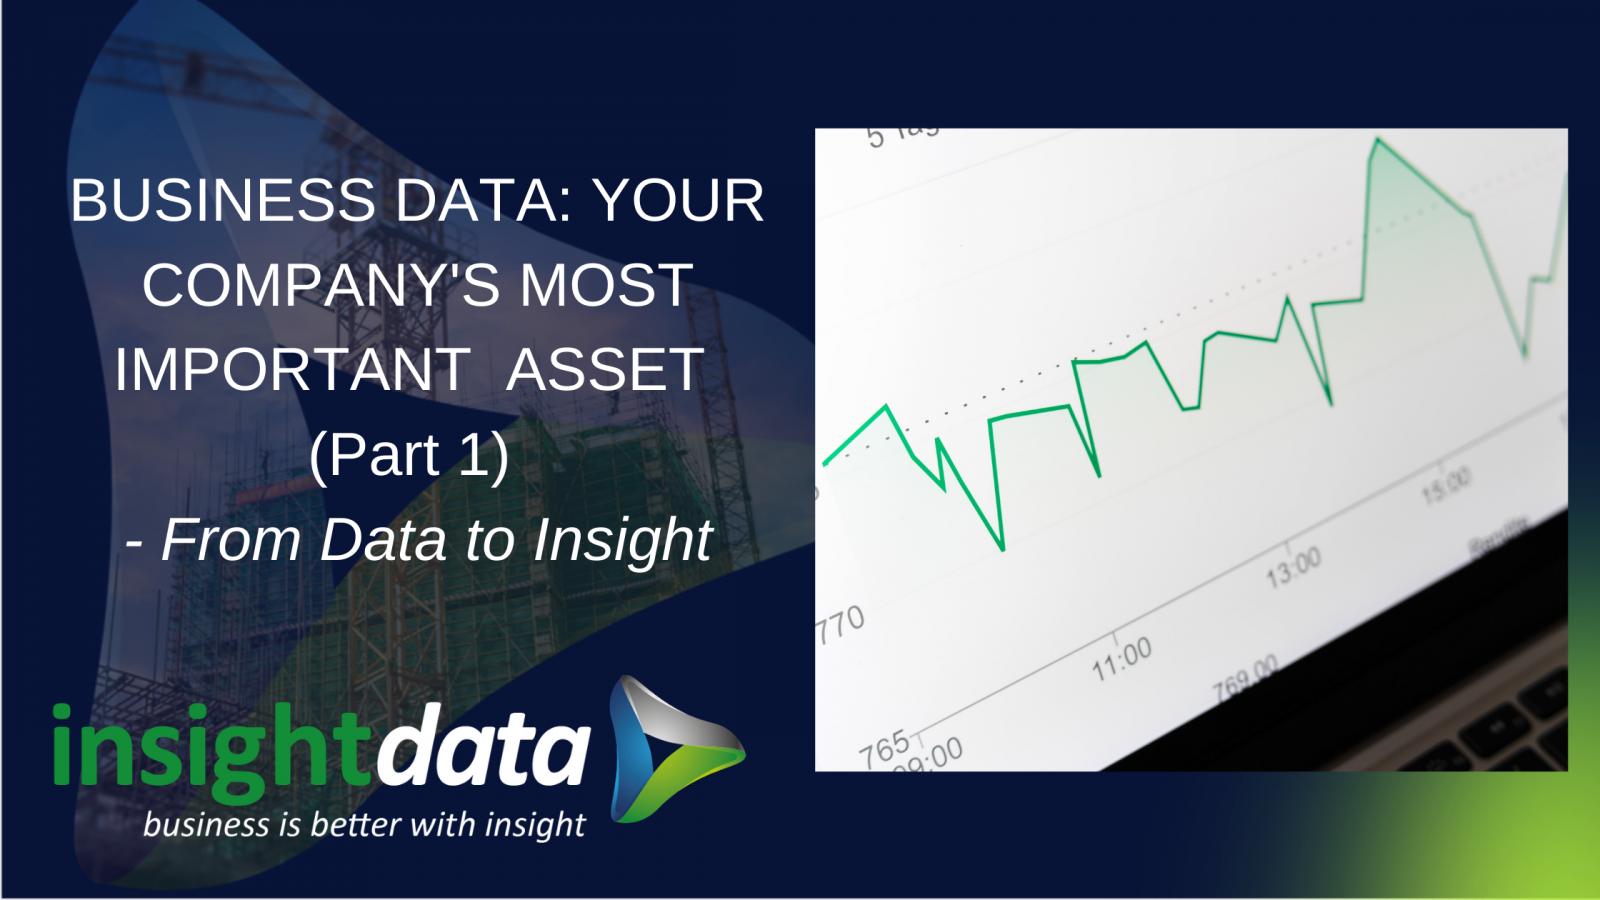 Customer data blog article card representing Insight Data